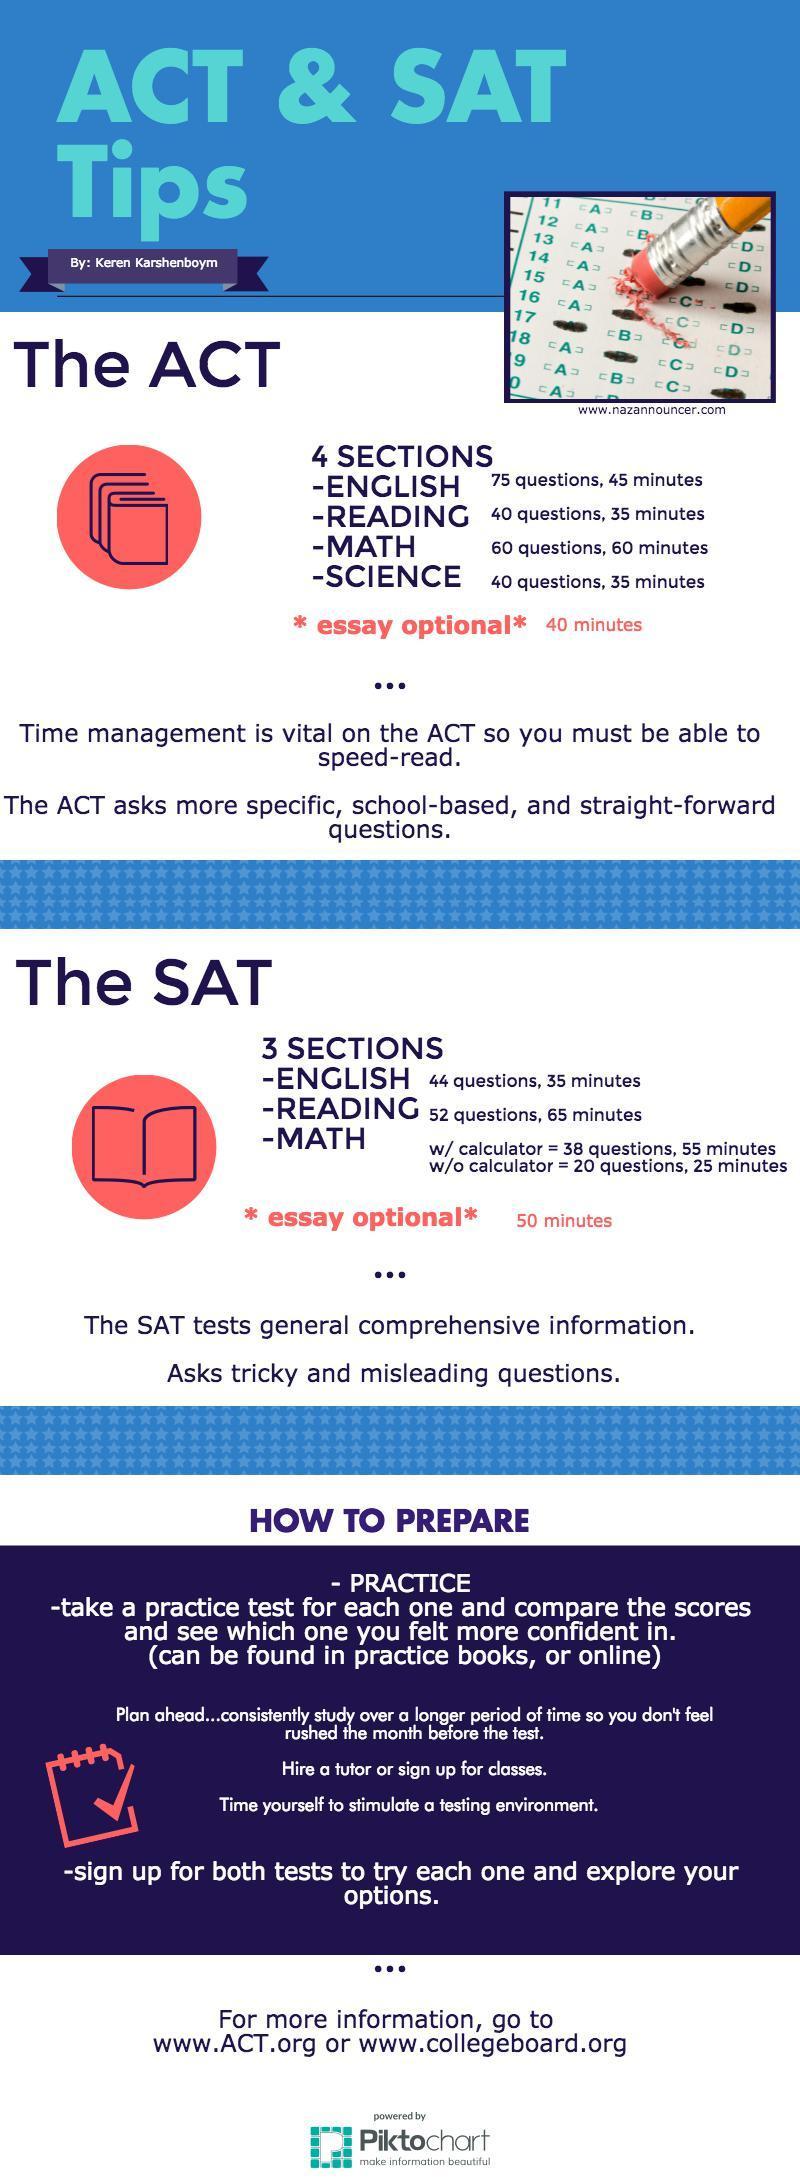 ACT & SAT Tips